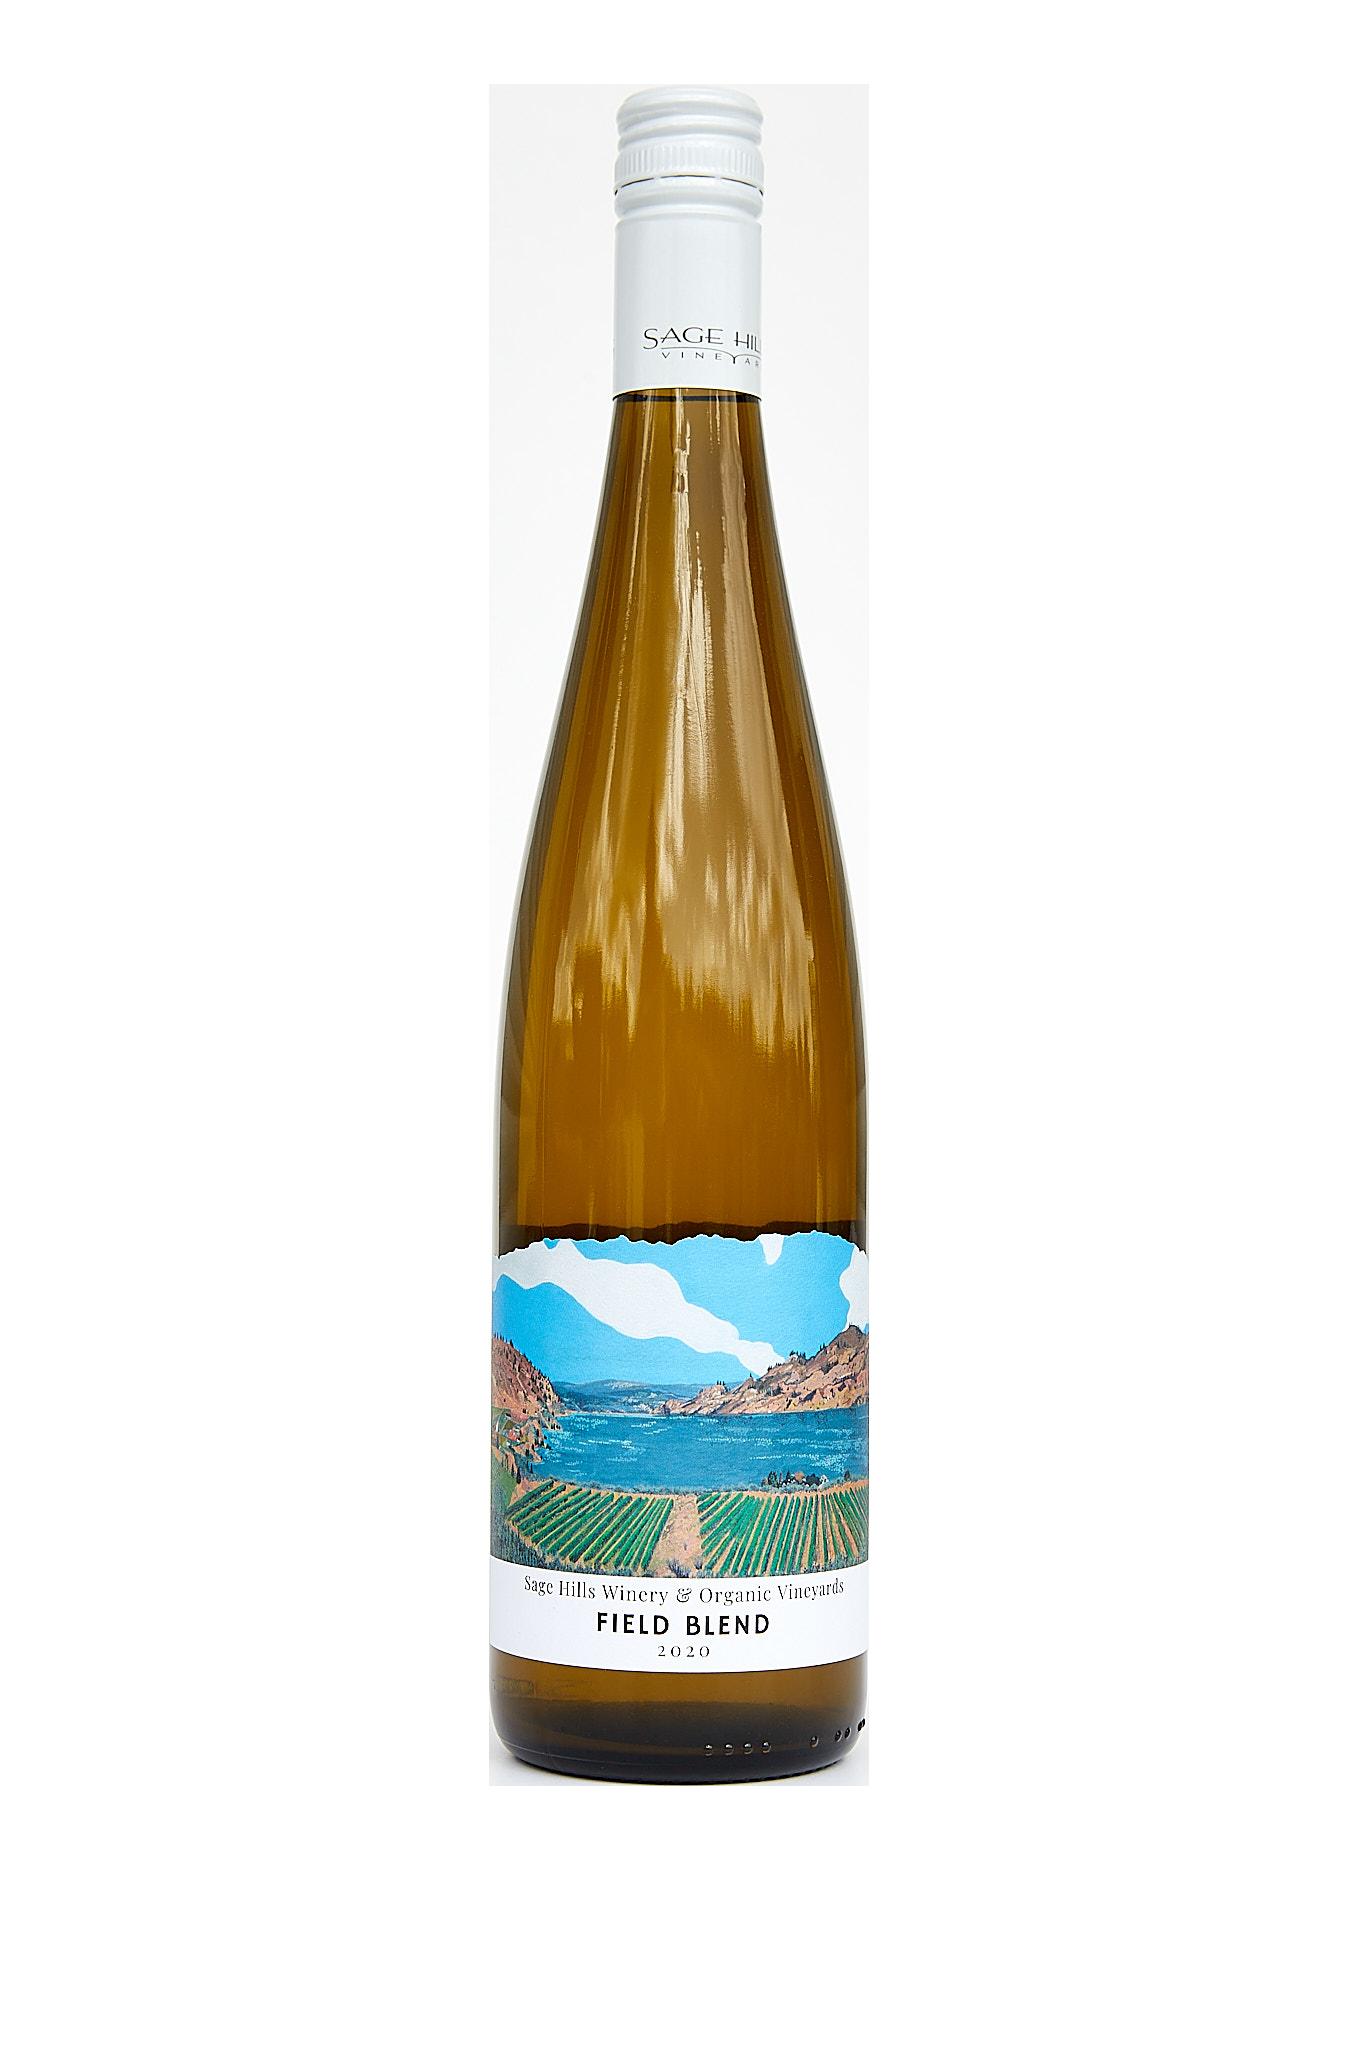 Field Blend 2020  Sage Hills Winery